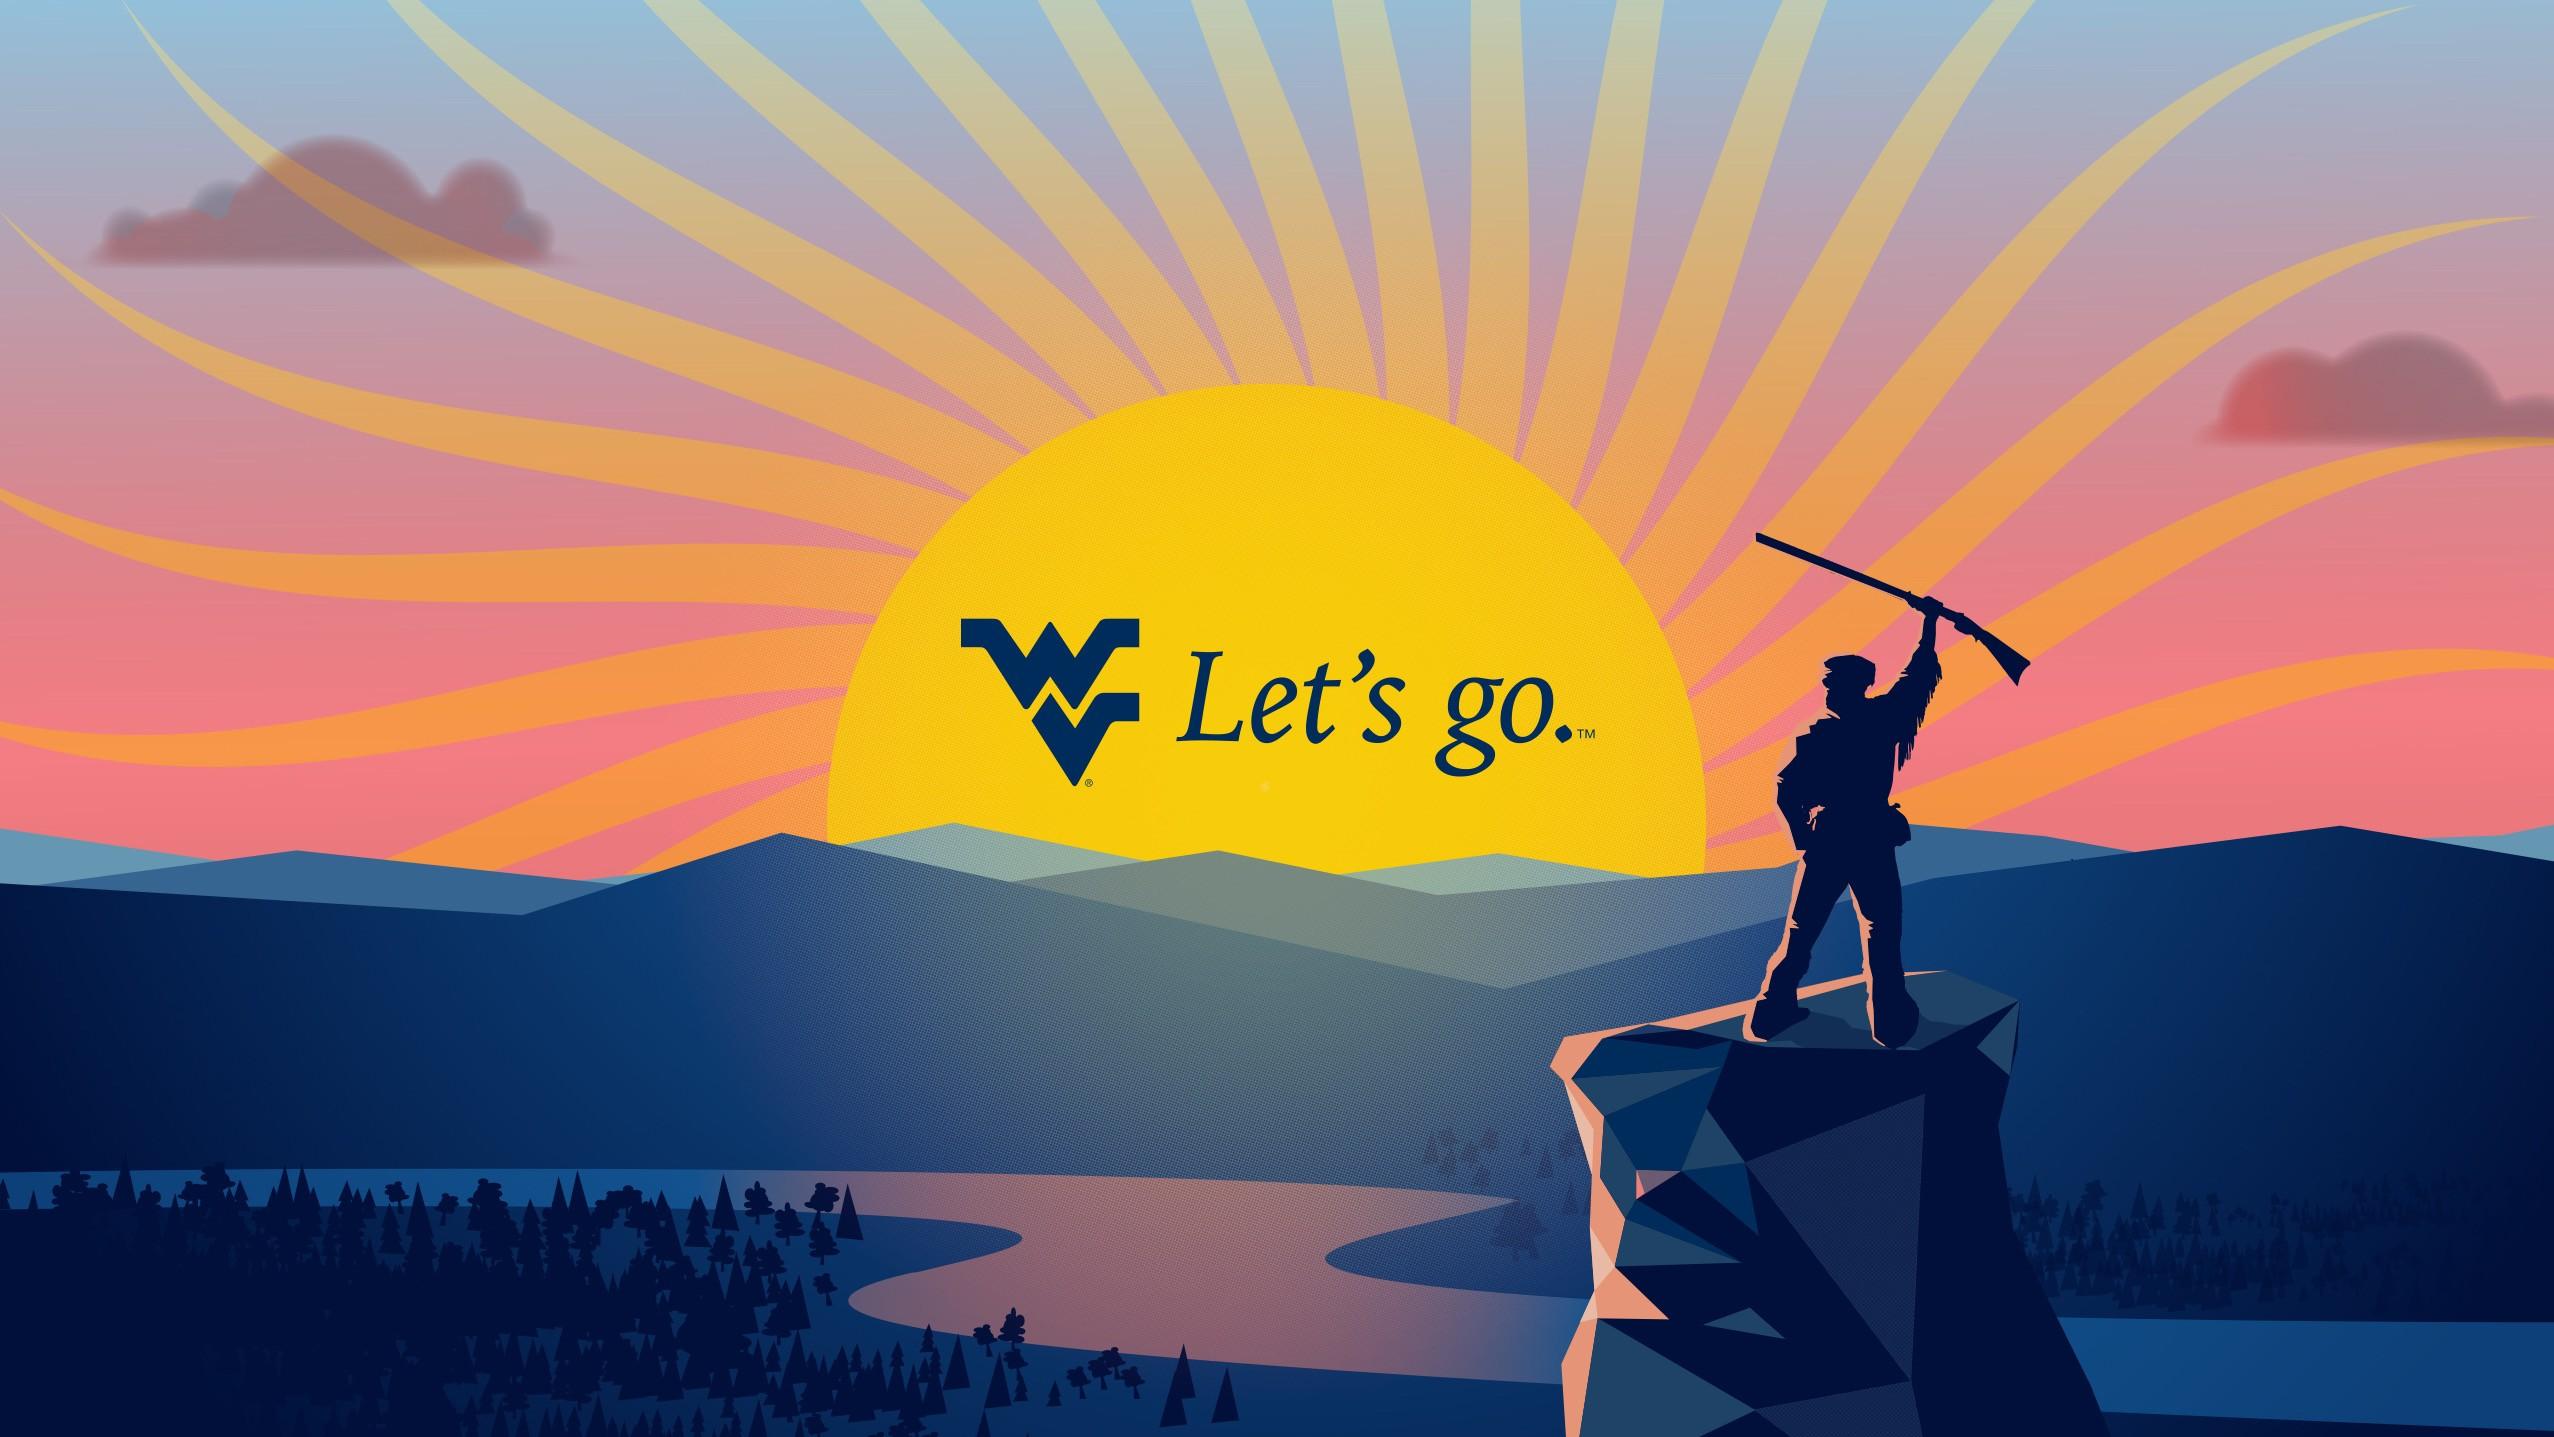 West Virginia University Address >> West Virginia University Linkedin